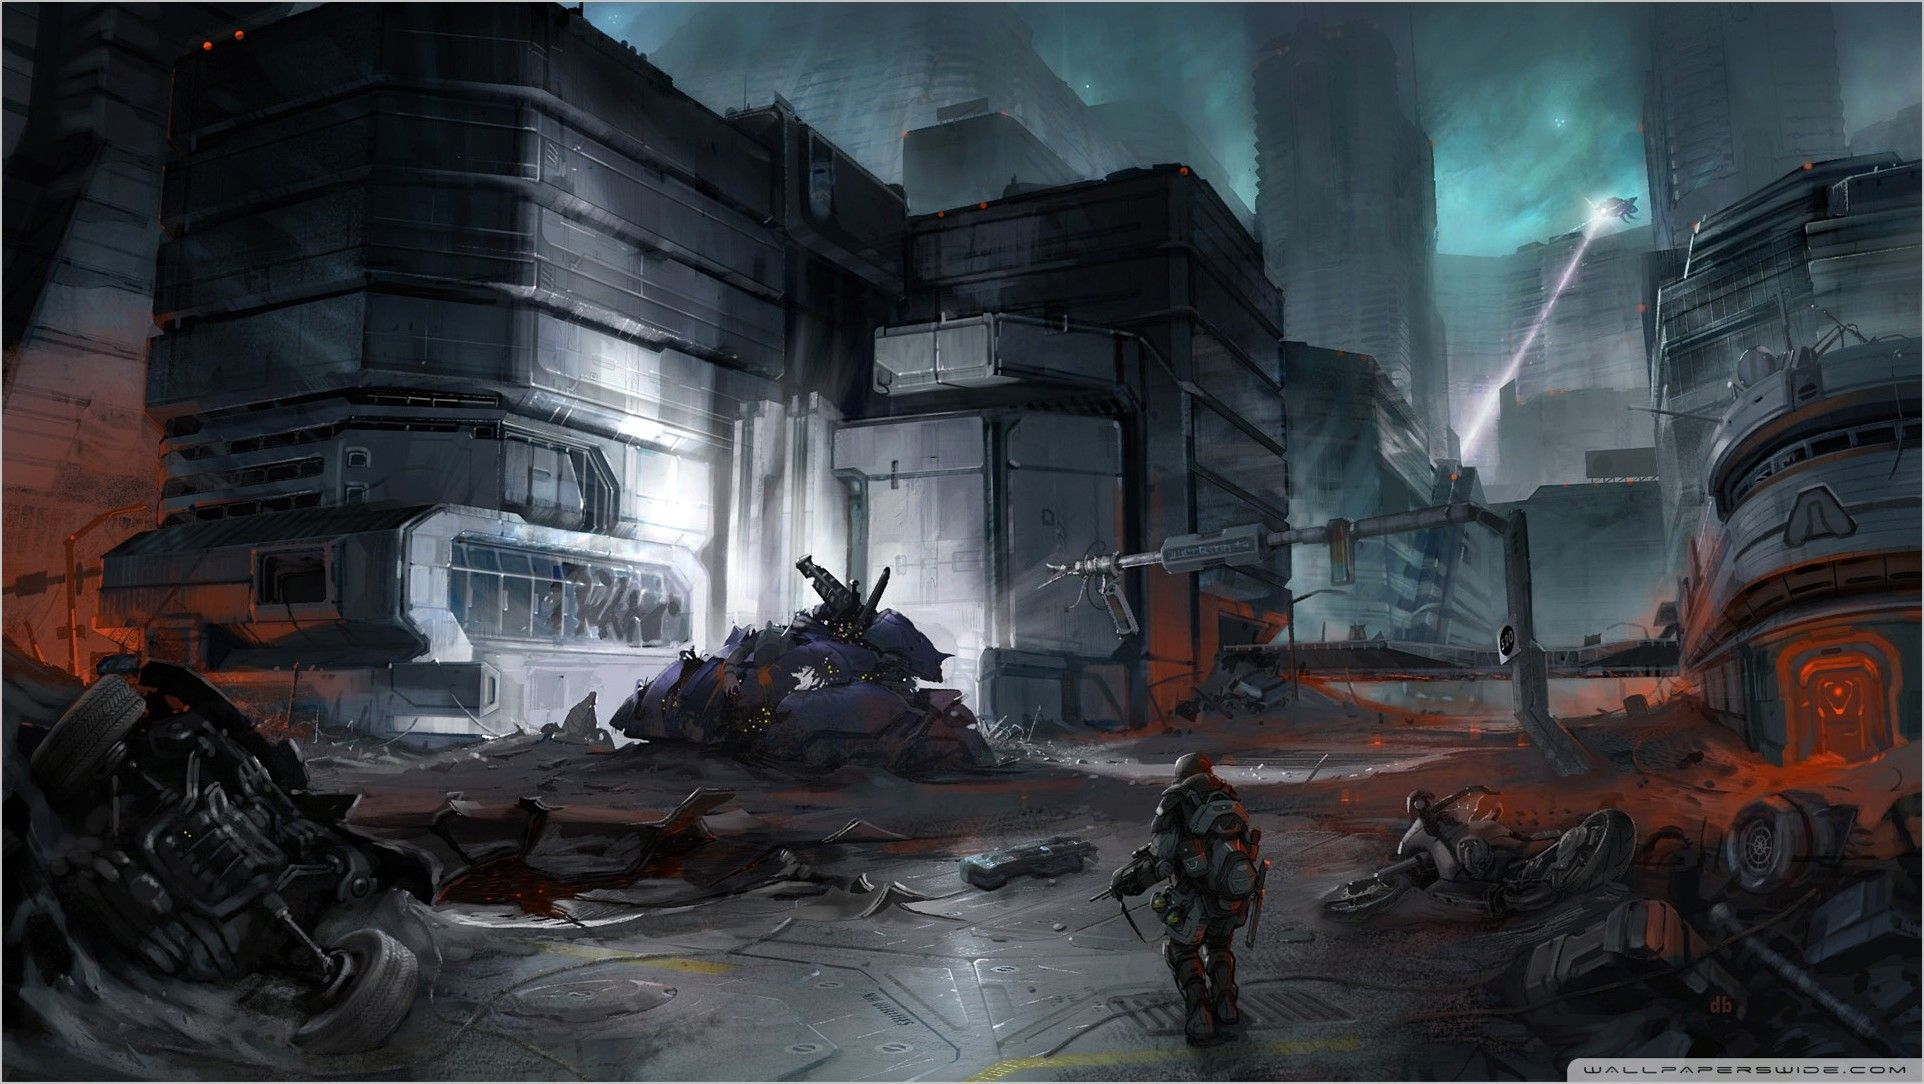 Halo 3 Odst Wallpaper 4k In 2020 Halo 3 Odst Halo Halo Game